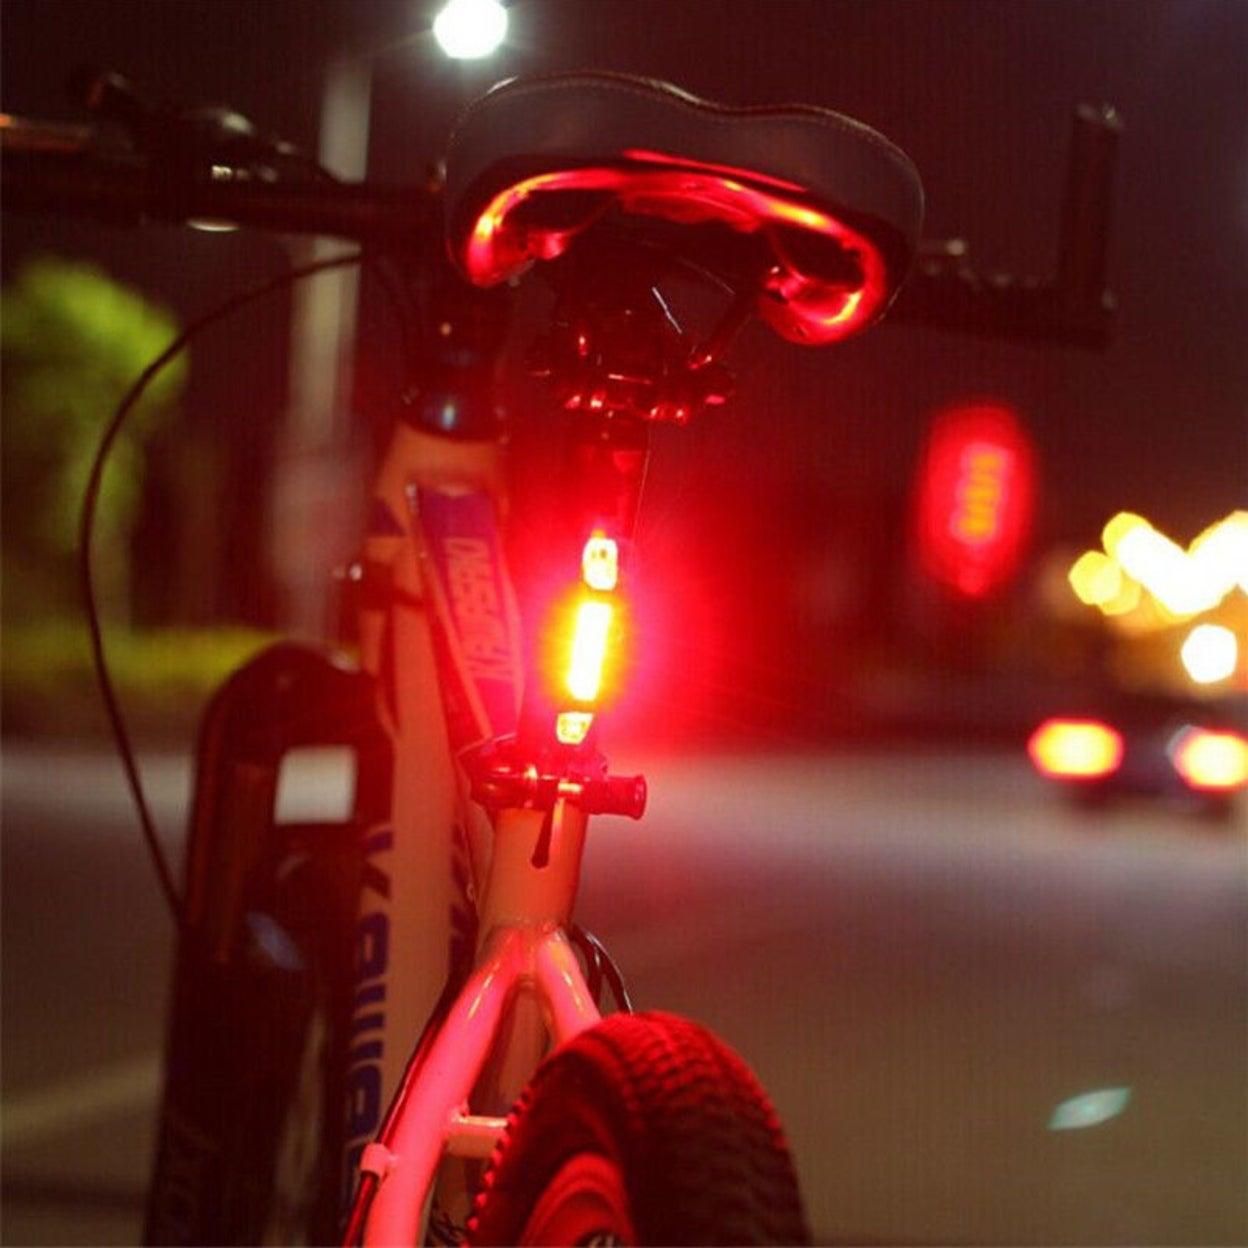 Sinalizador Traseiro Bike Luz Led Recarregável Bicicleta Lanterna traseira Bike